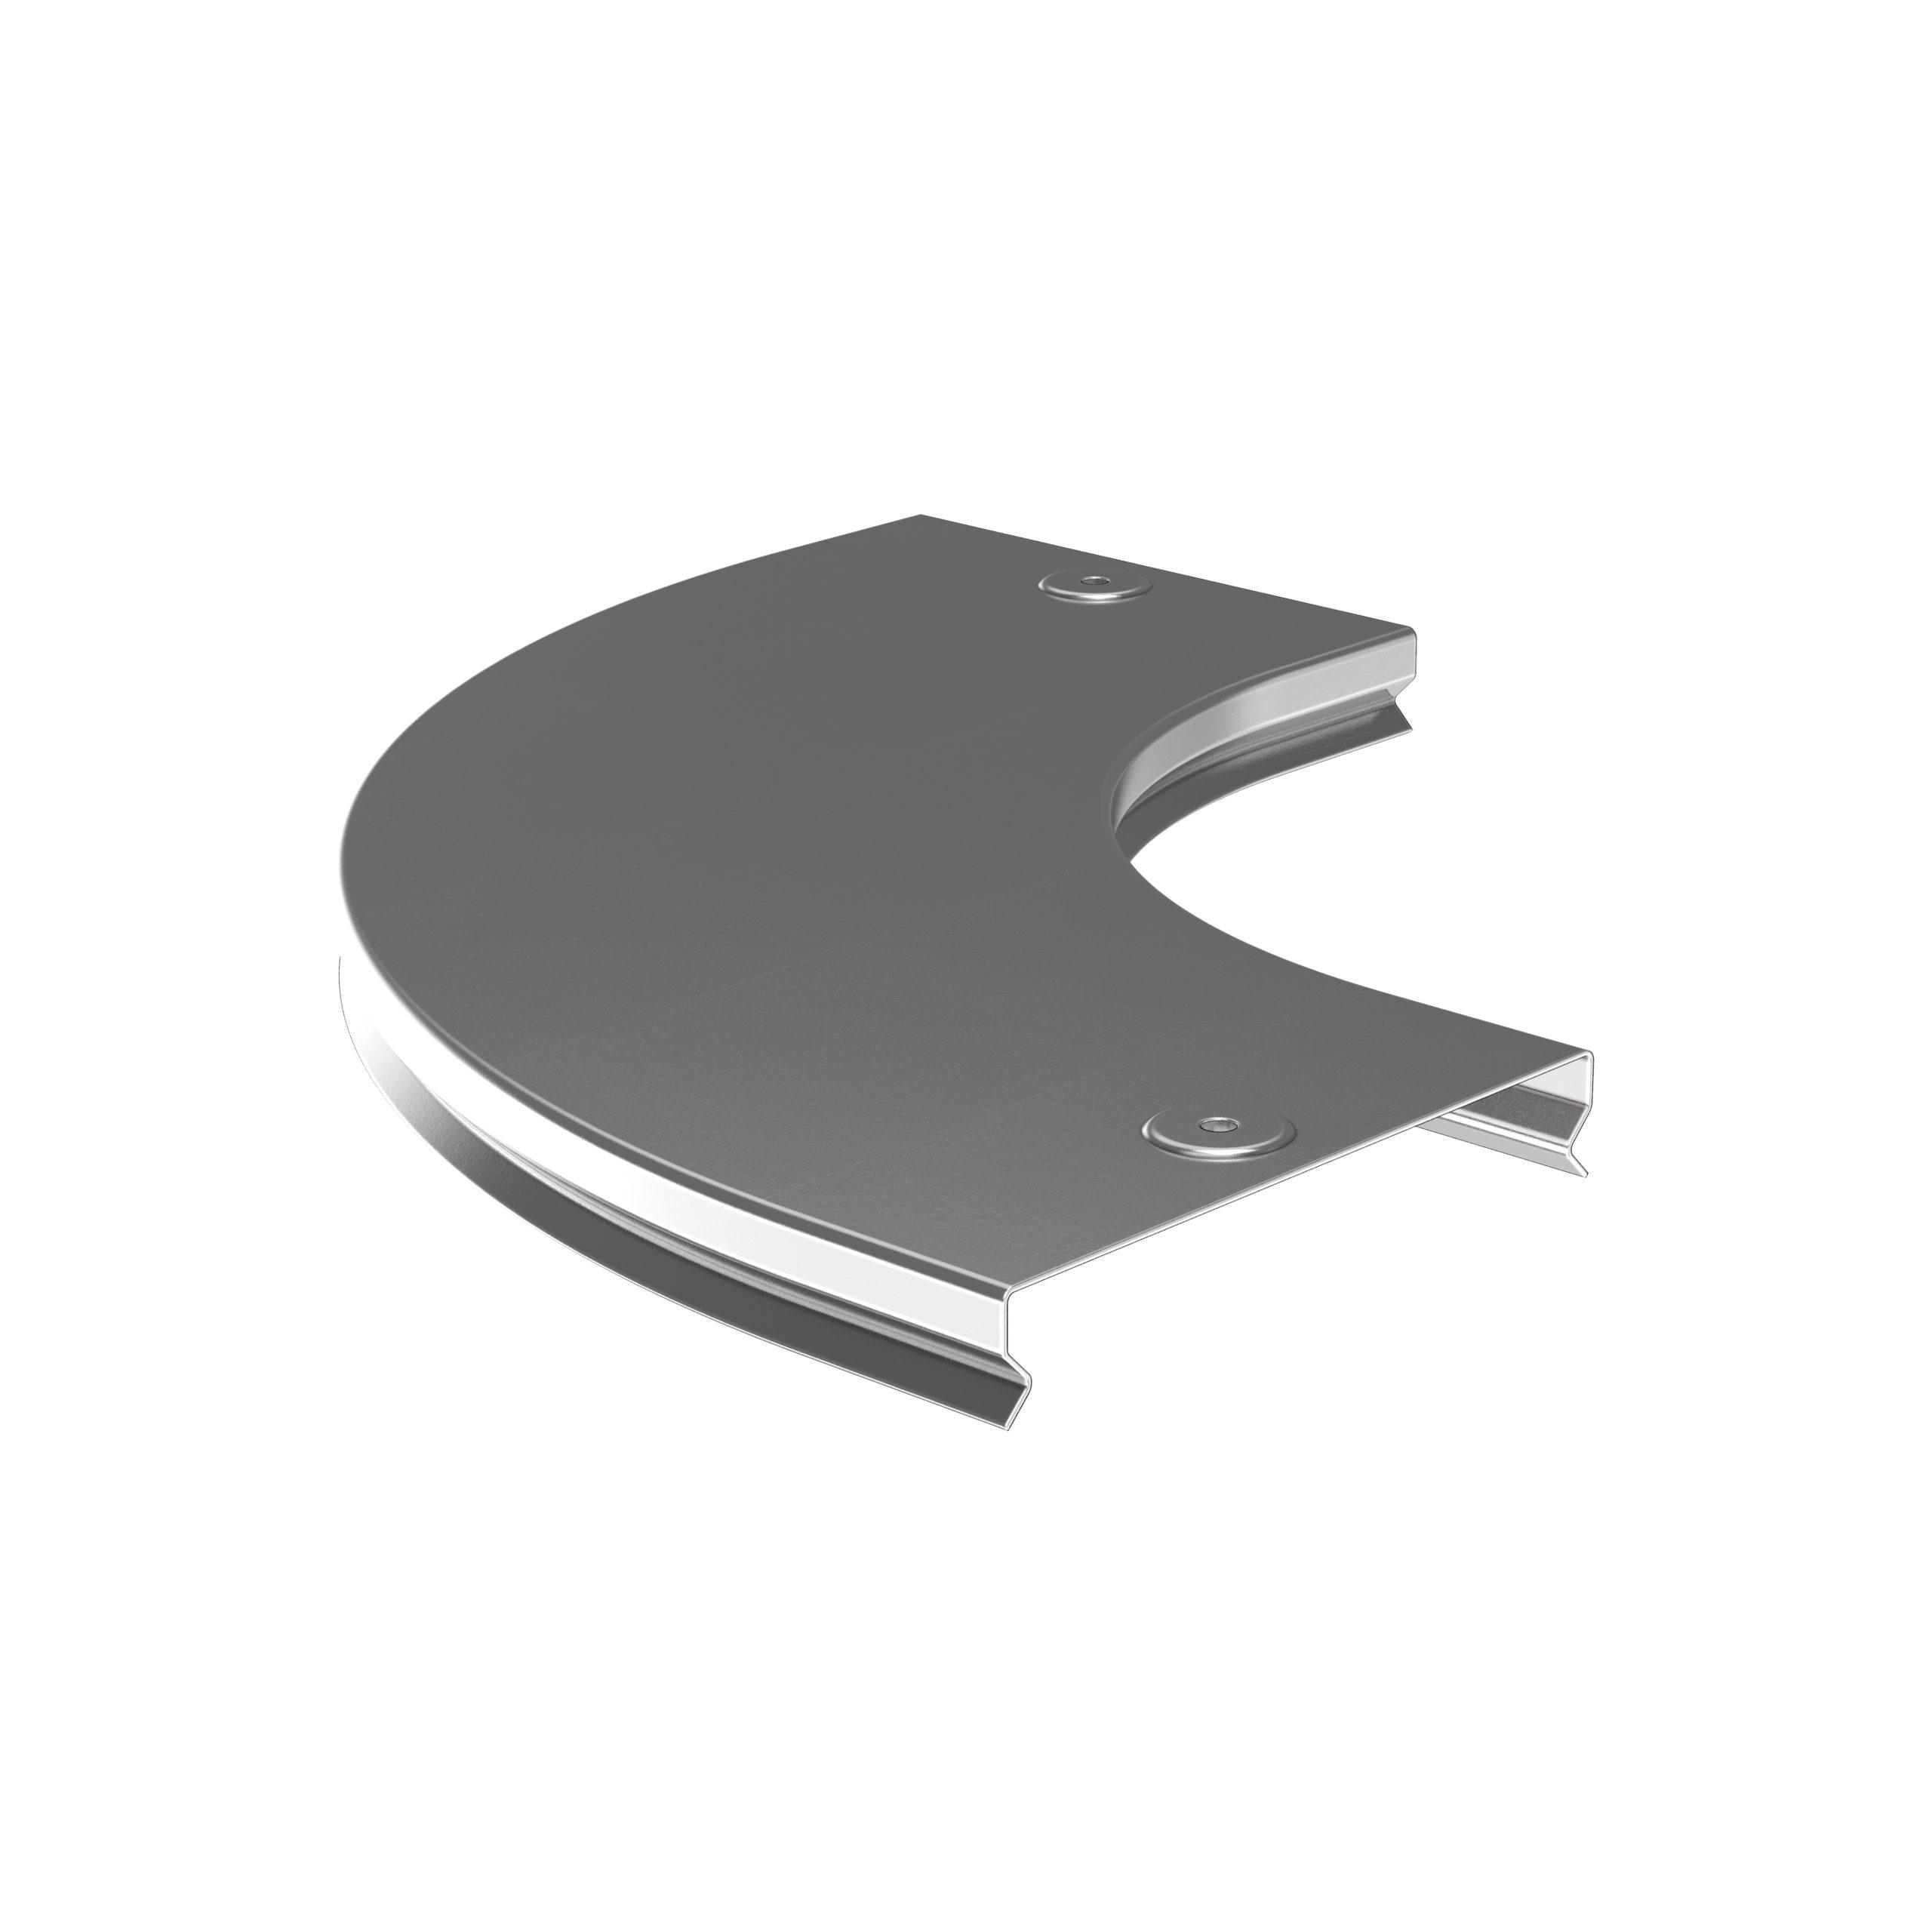 Крышка поворота плавного 90град (тип Г01) ESCA 100мм IEK 1